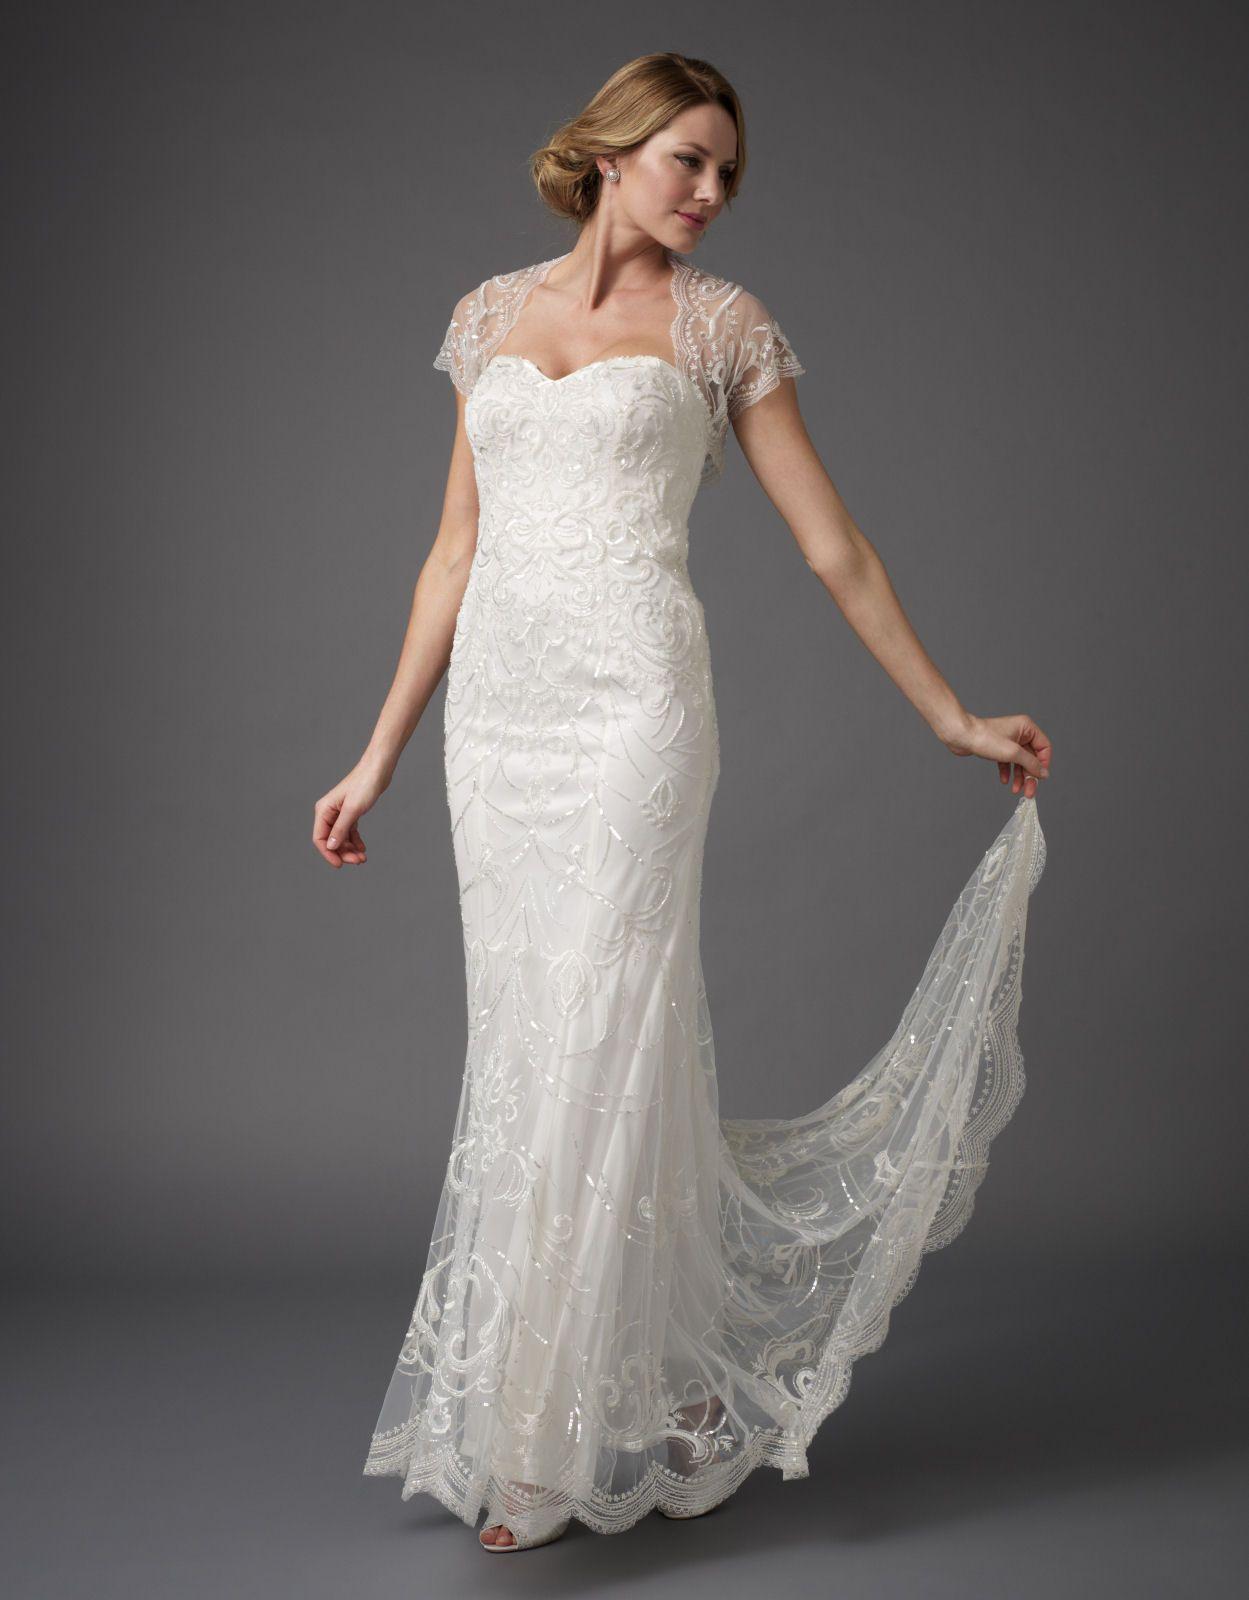 Ellis Bridal Set From Monsoon Bridal Wedding Dress Brands Bridal Dresses Most Beautiful Wedding Dresses